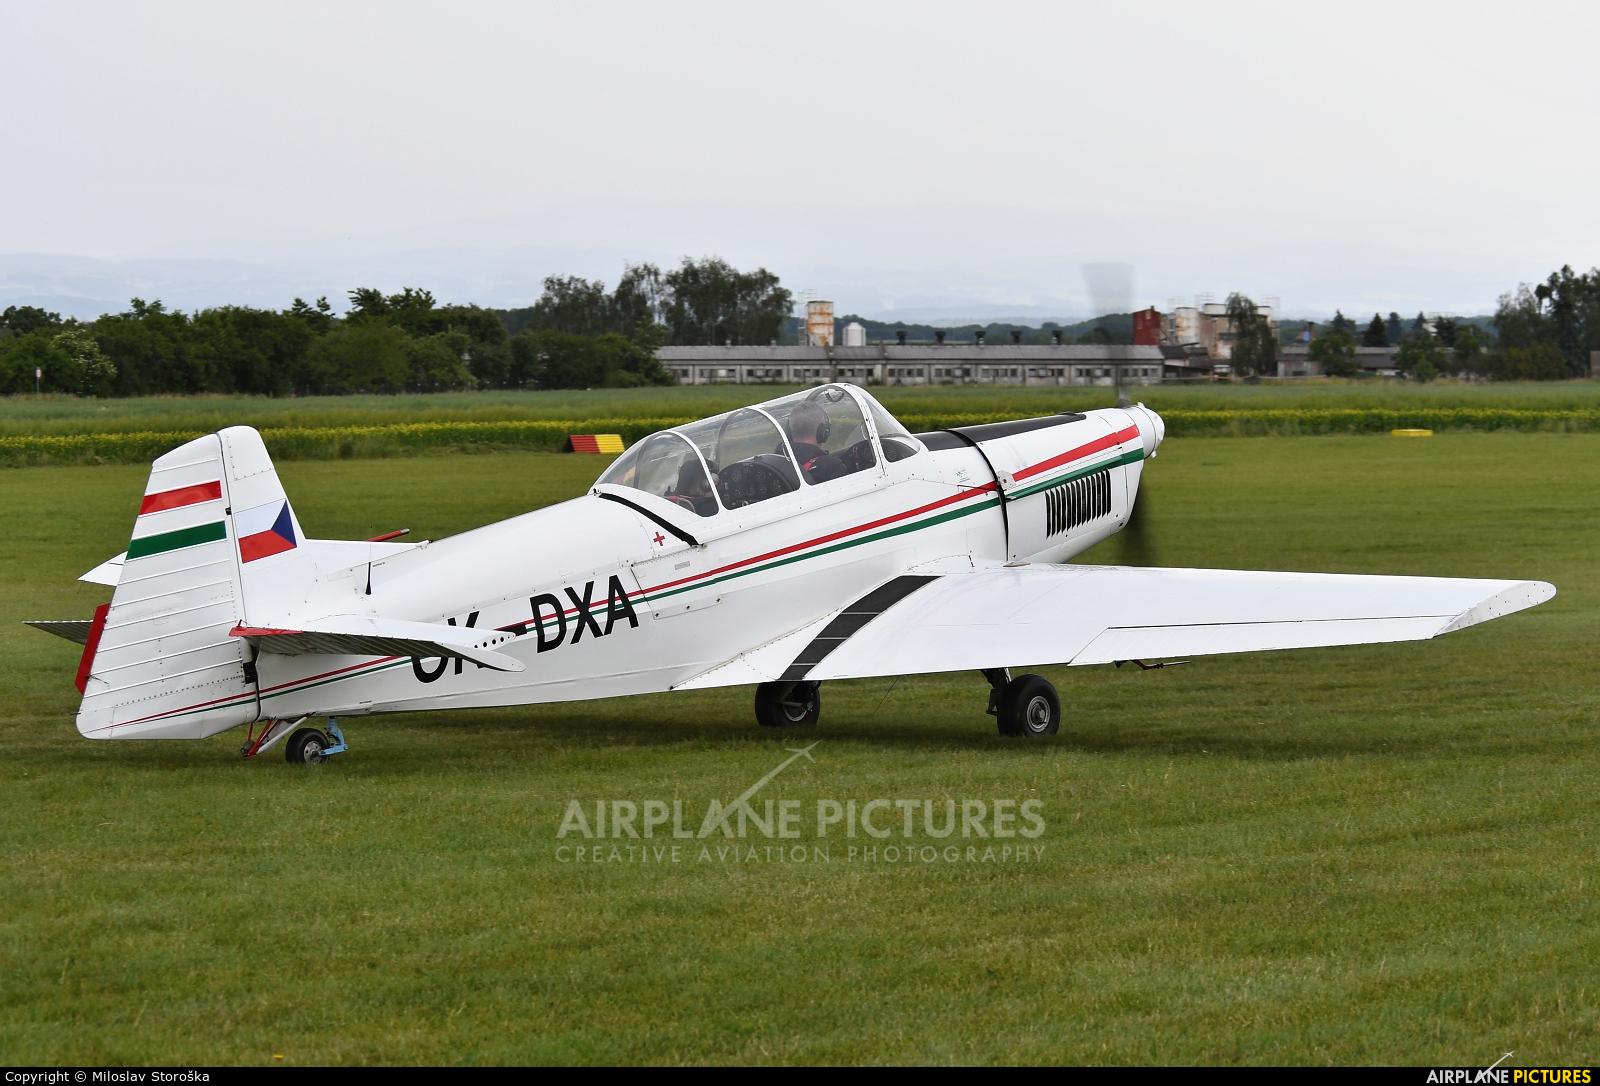 Aeroklub Luhačovice OK-DXA aircraft at Jaroměř - Josefov